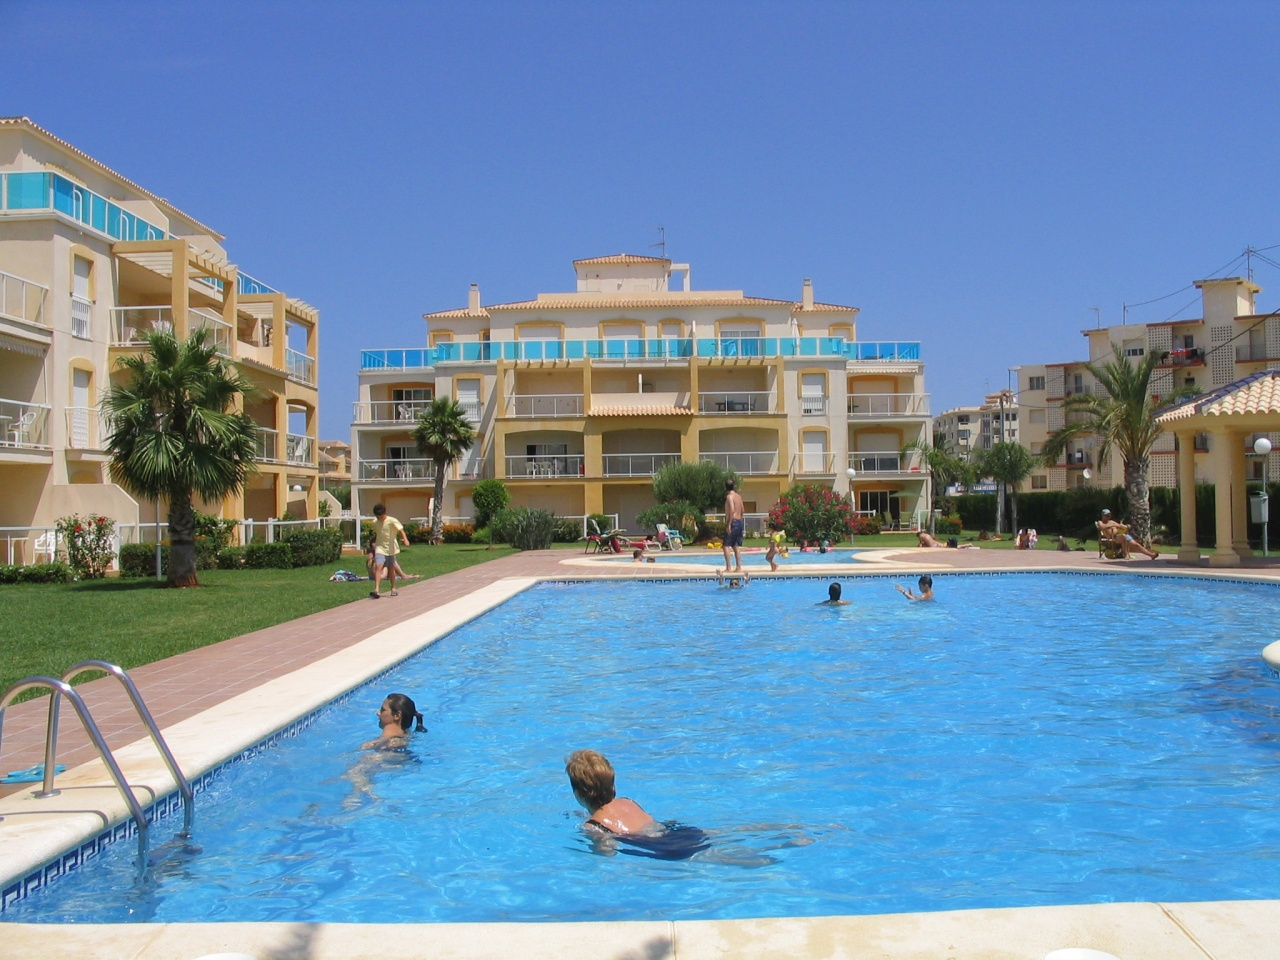 denia hoteles: